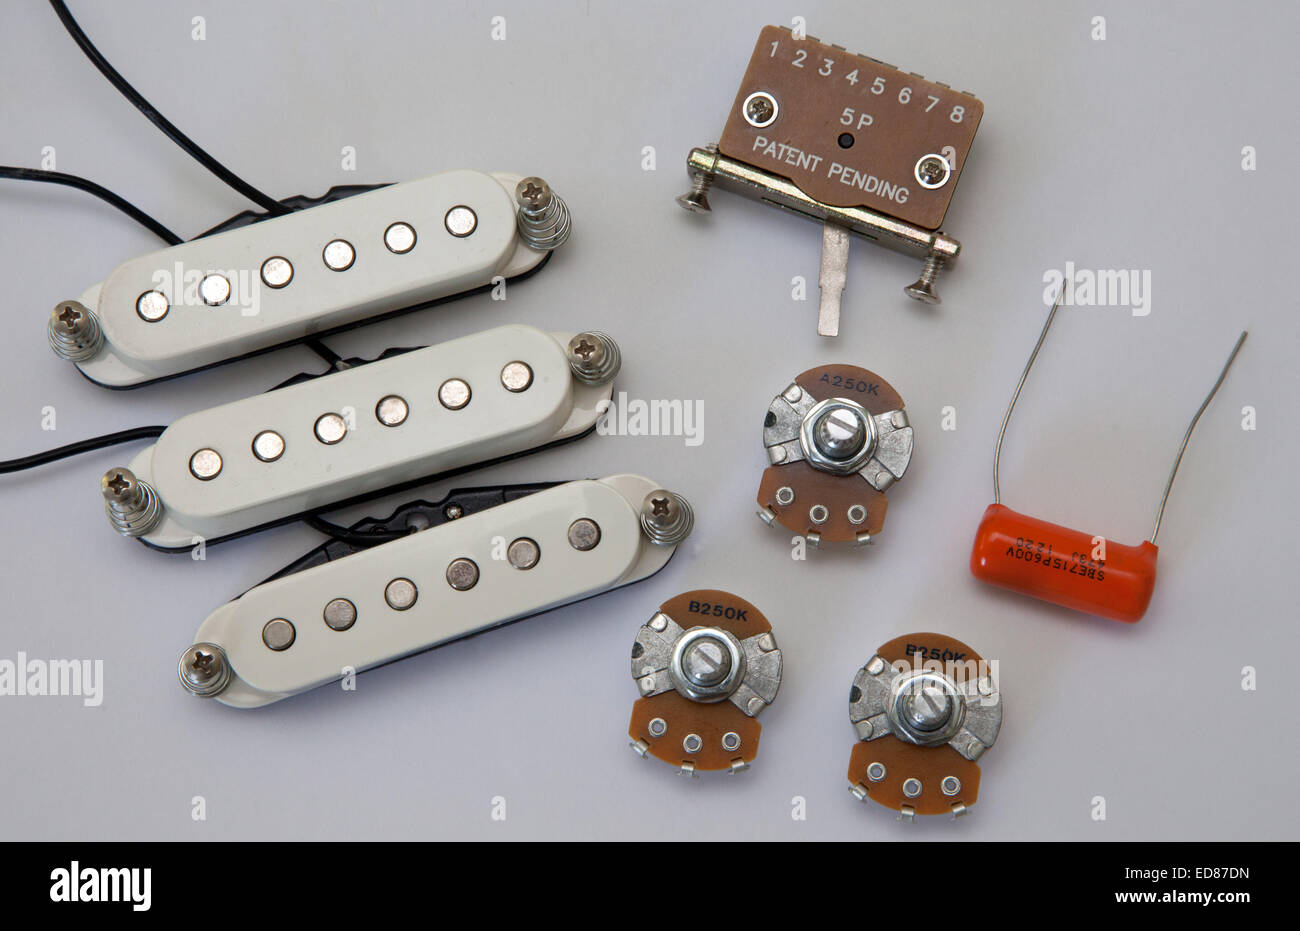 Komponenten von einer e-Gitarre, Pick up, Volume Klangregler, Selektor wechseln, Kondensator, Potentiometer Stockbild